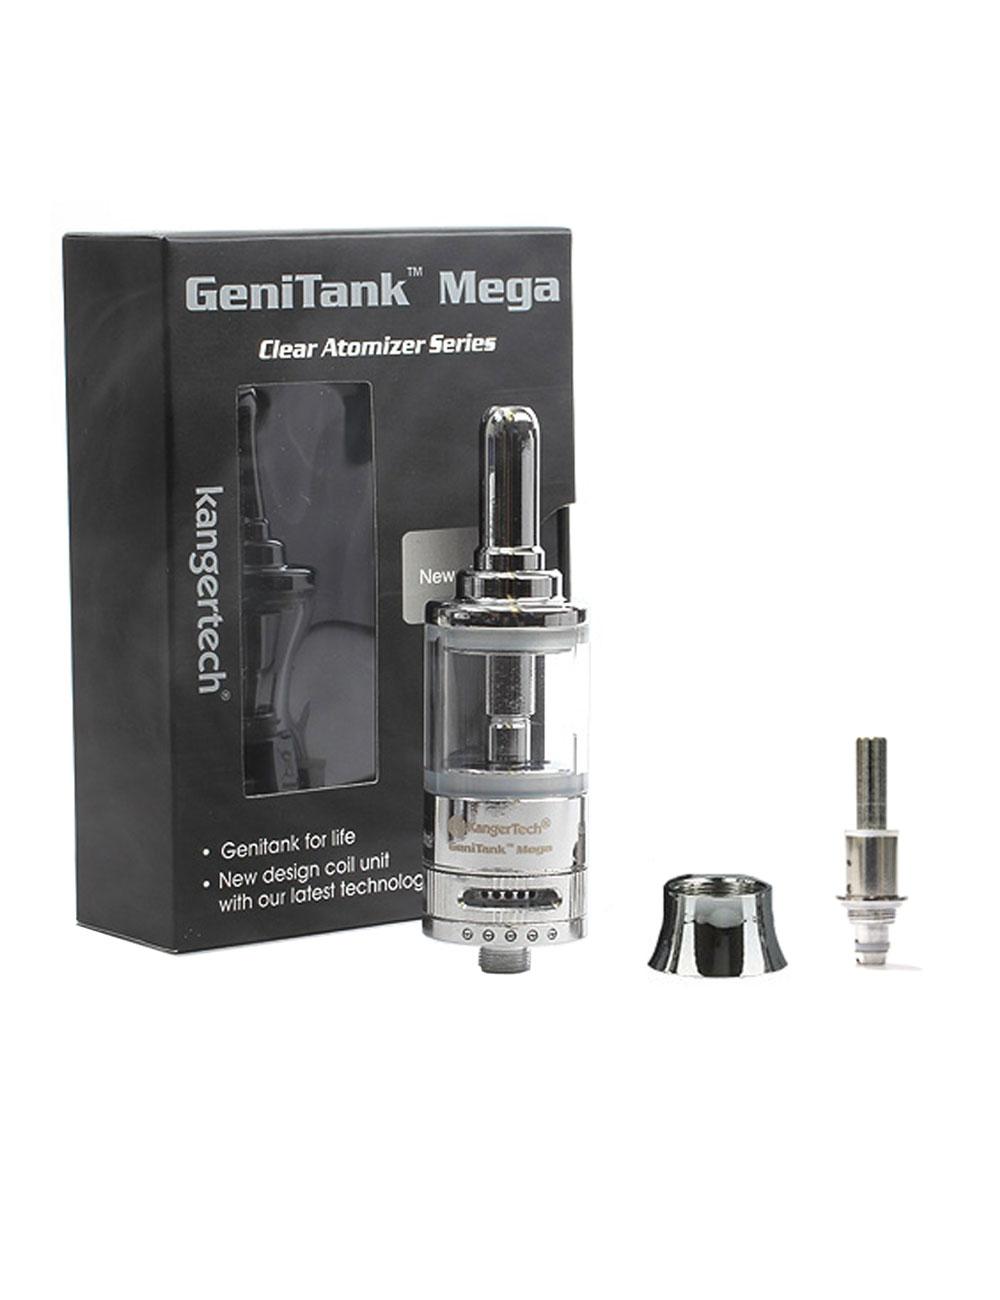 Kanger Genitank Mega E cigarette Clearomizer Tank